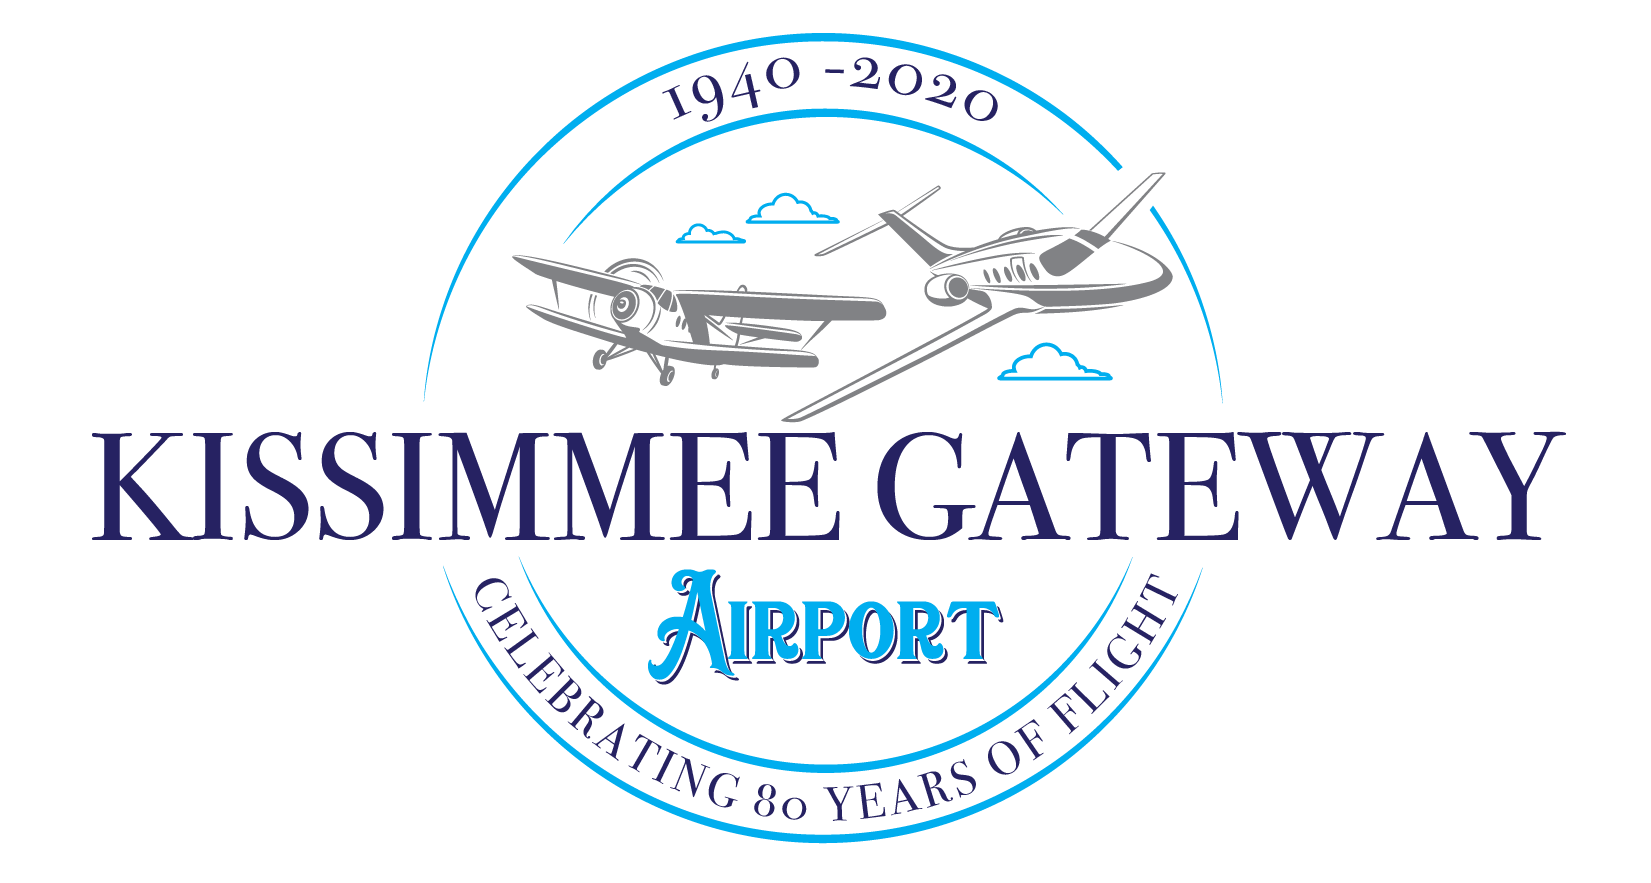 Kissimmee Gateway Airport